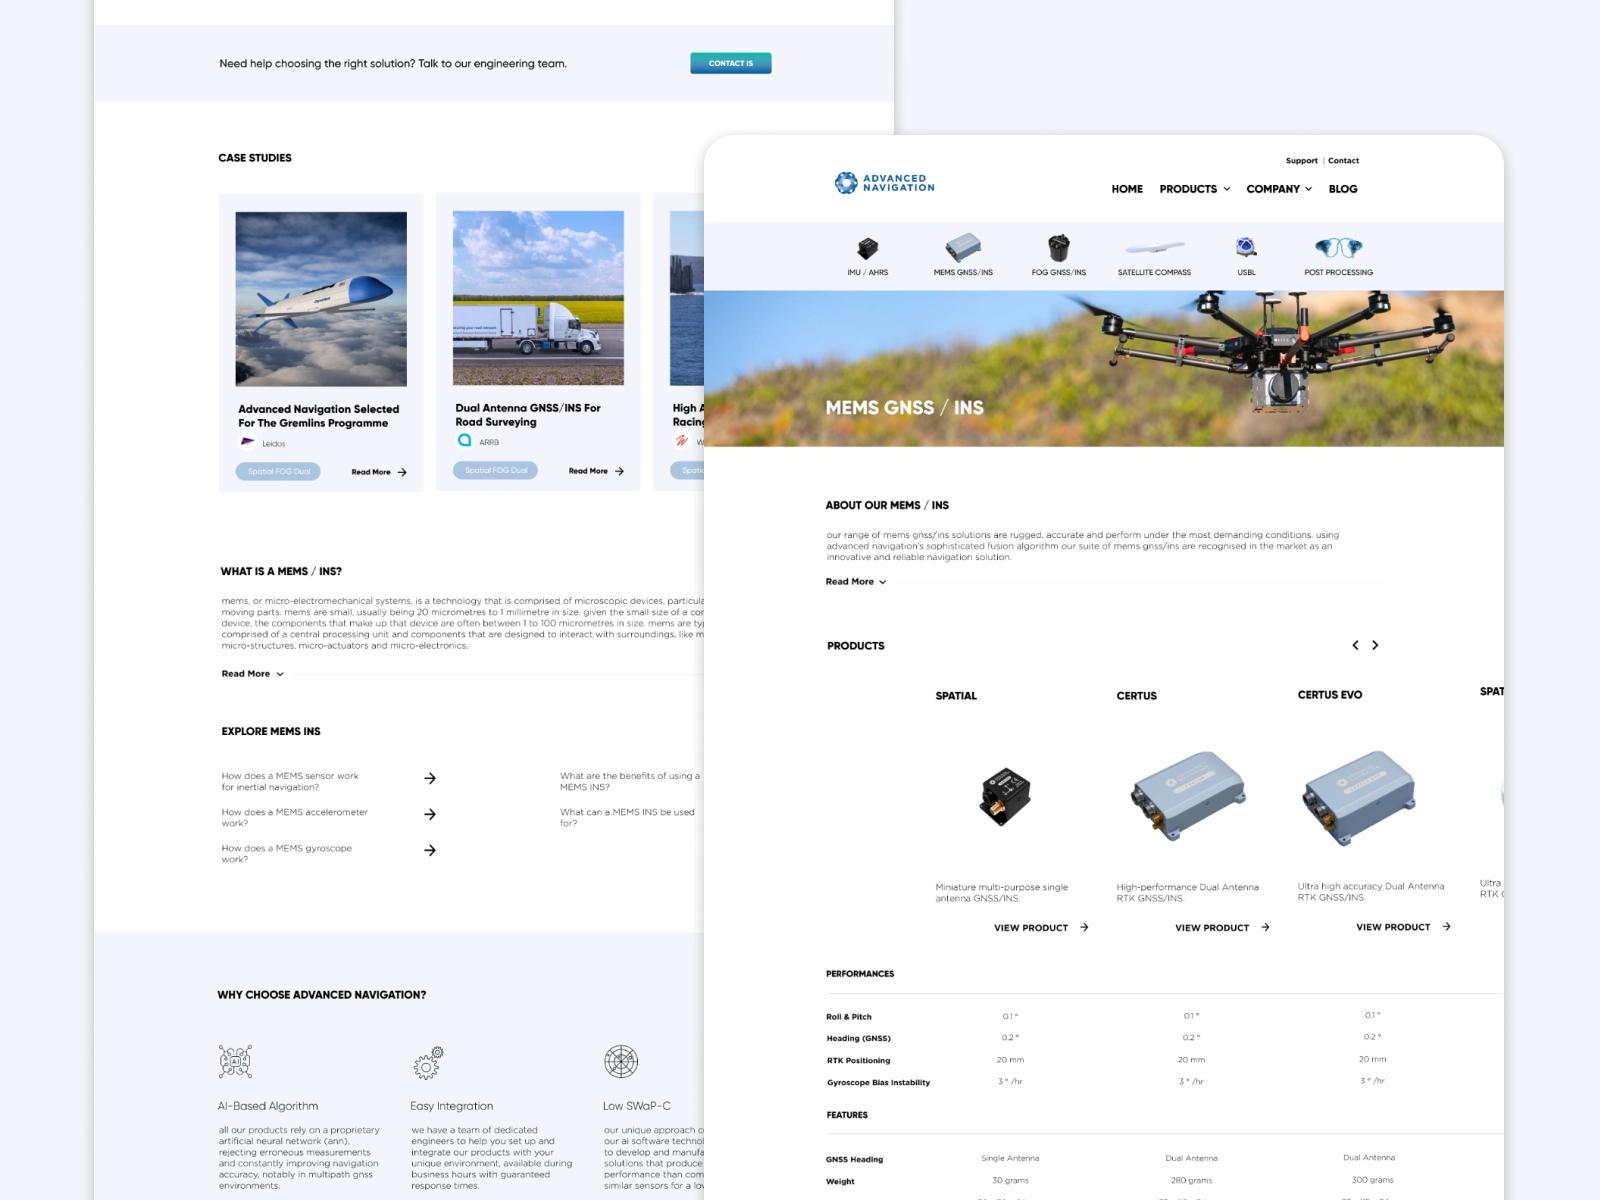 Category Page Mockup